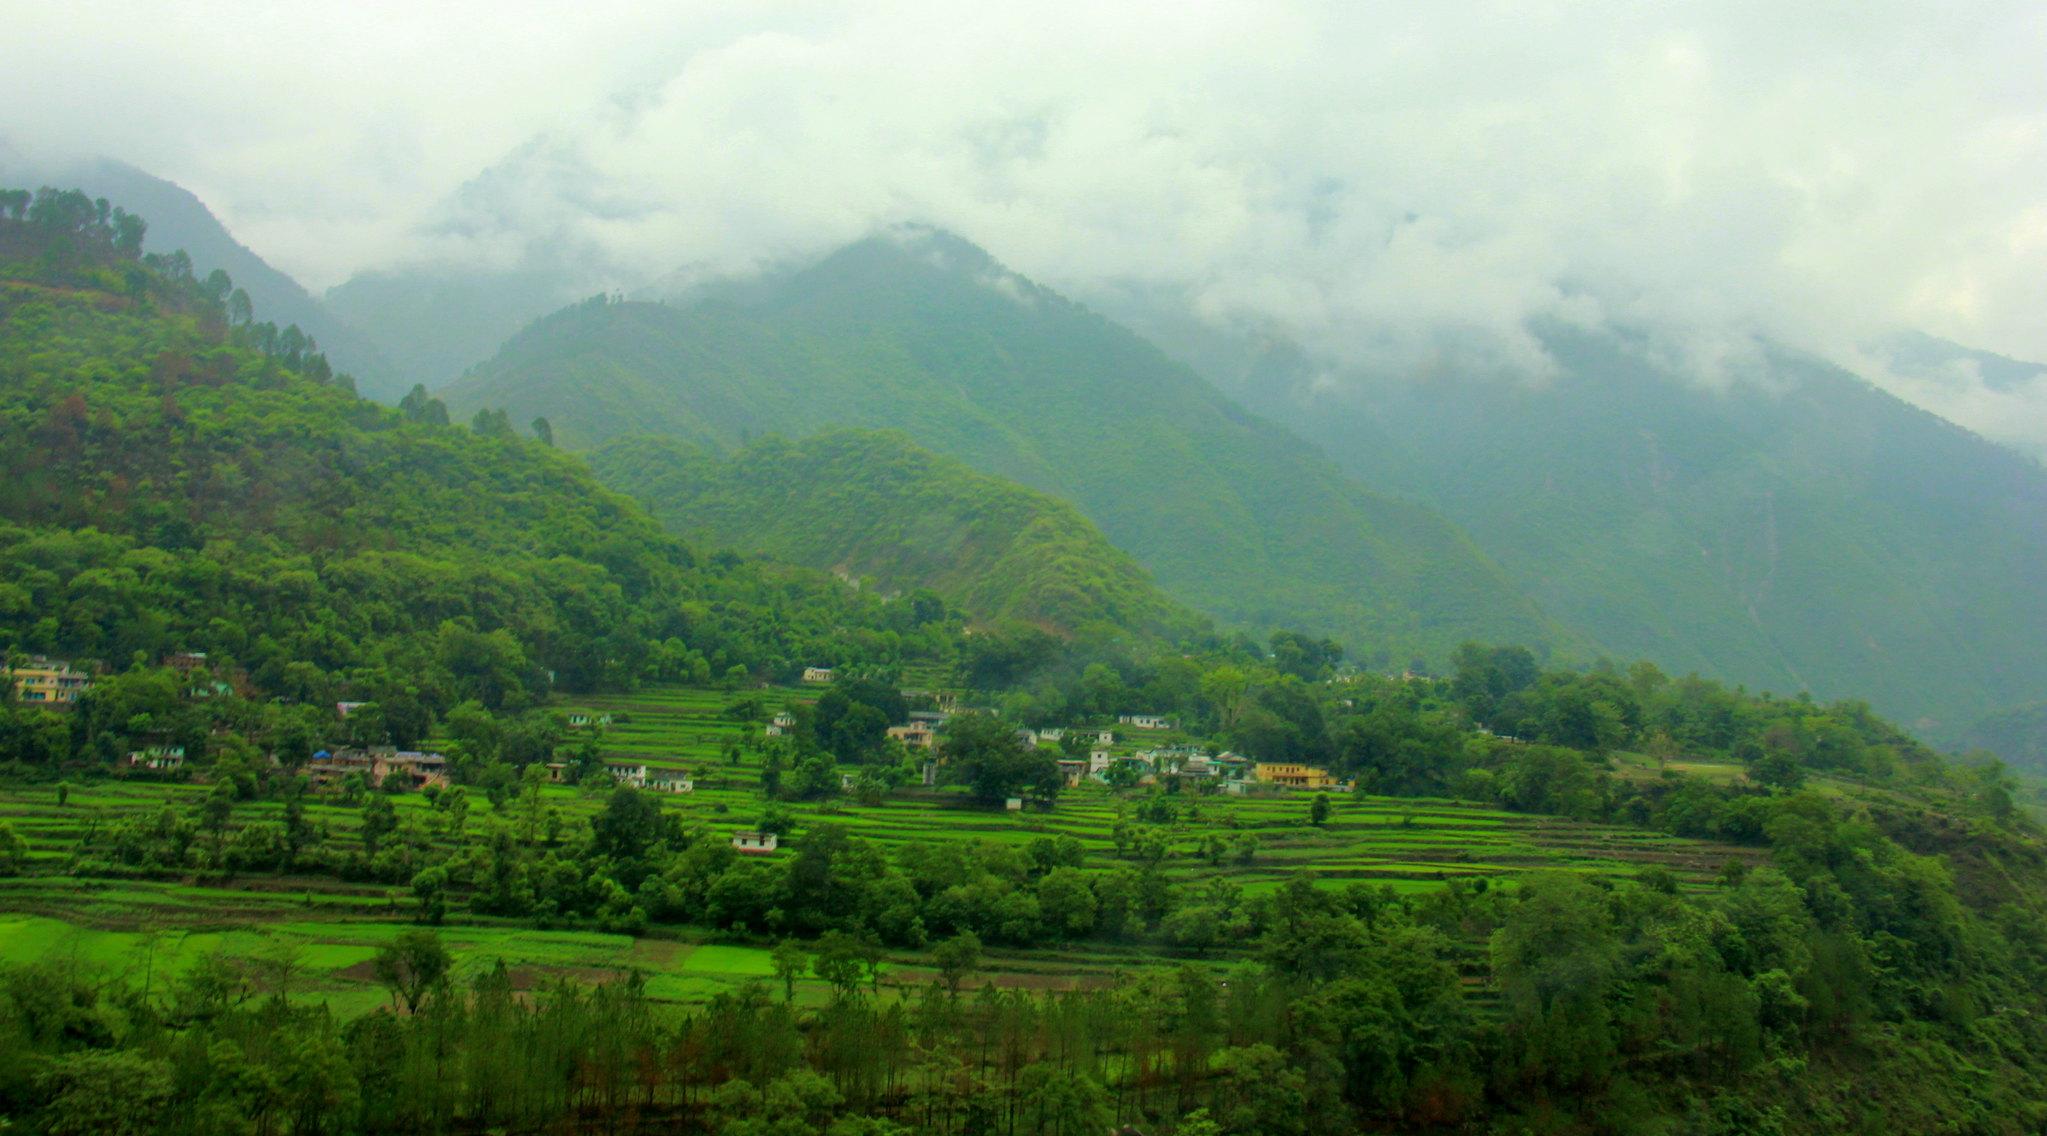 Beautiful Himalayas welcome you into the area of uttarakhand prayags